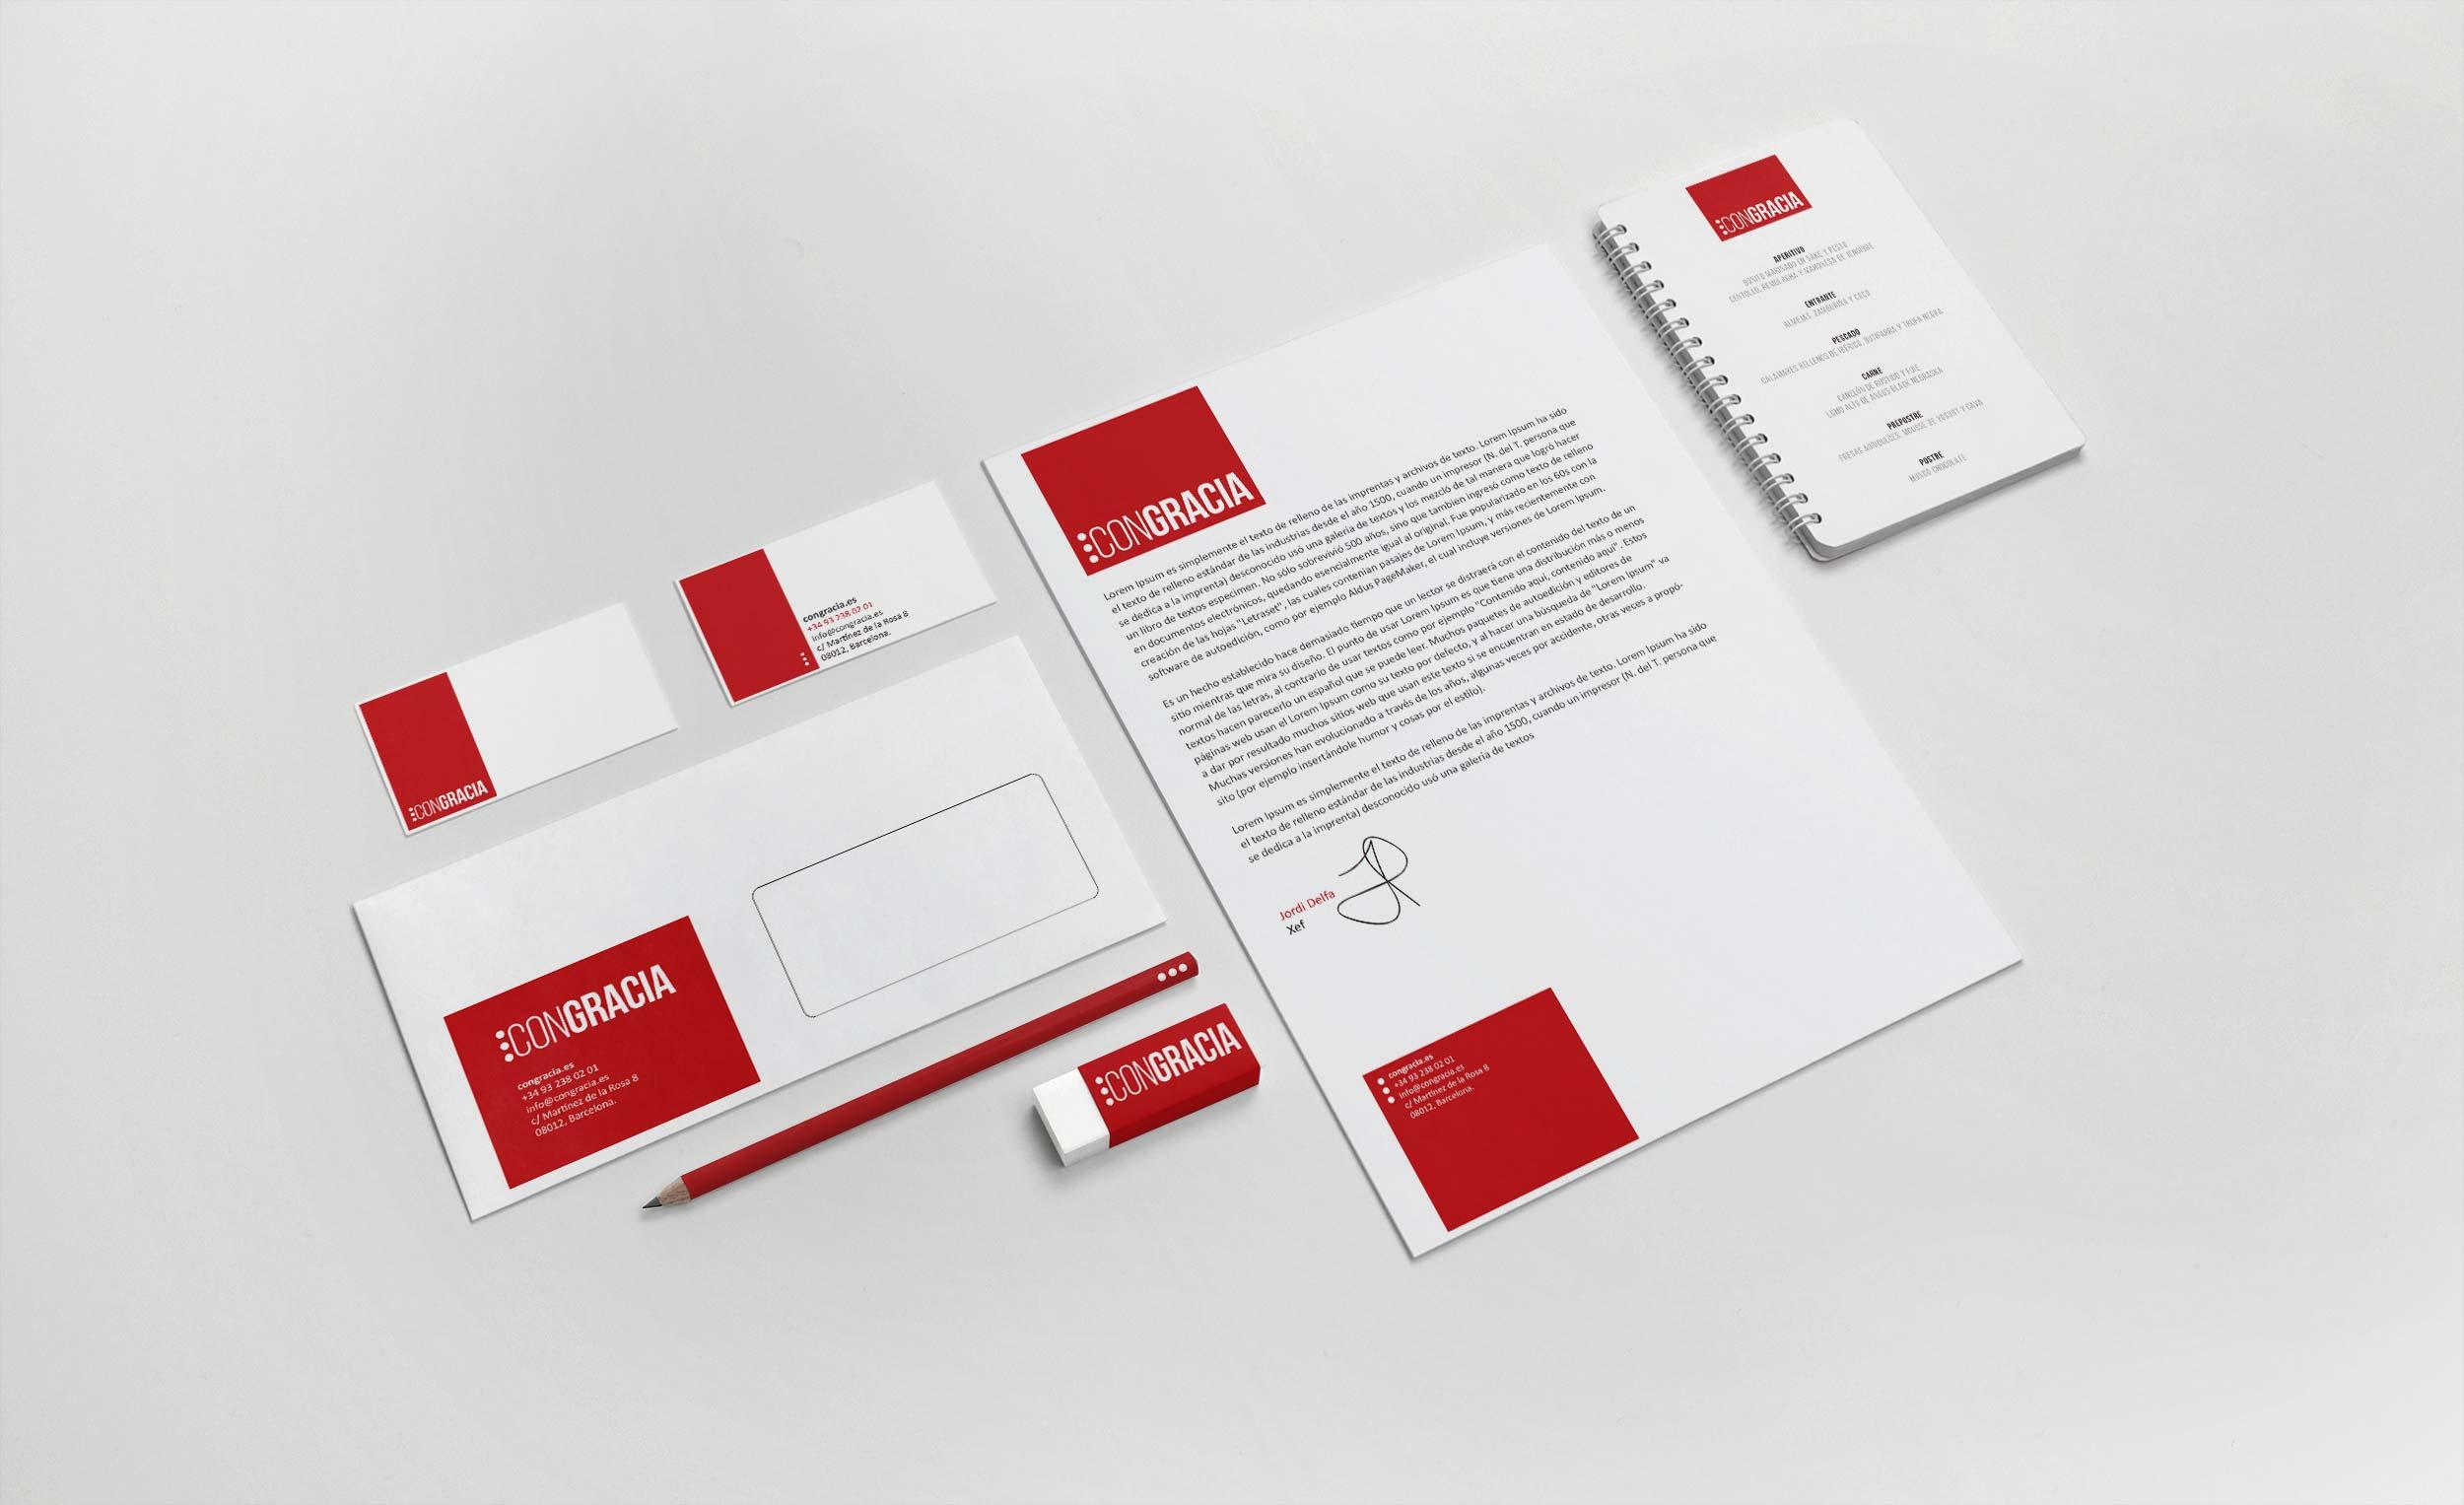 diseno-grafico-papeleria-corporativa-identidad-congracia